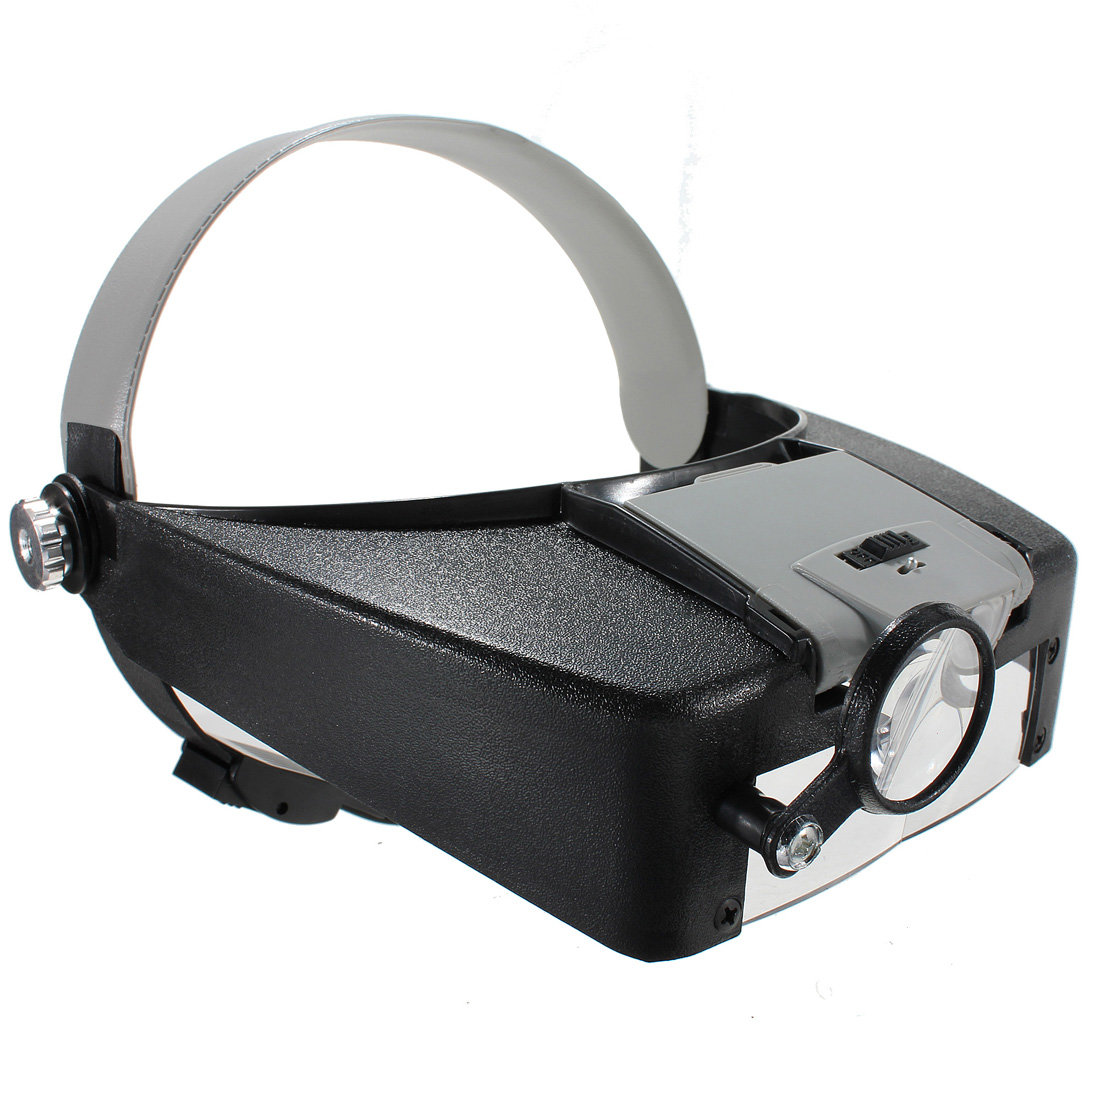 10X Lighted Magnifying Glass Headset LED Headband Loupe